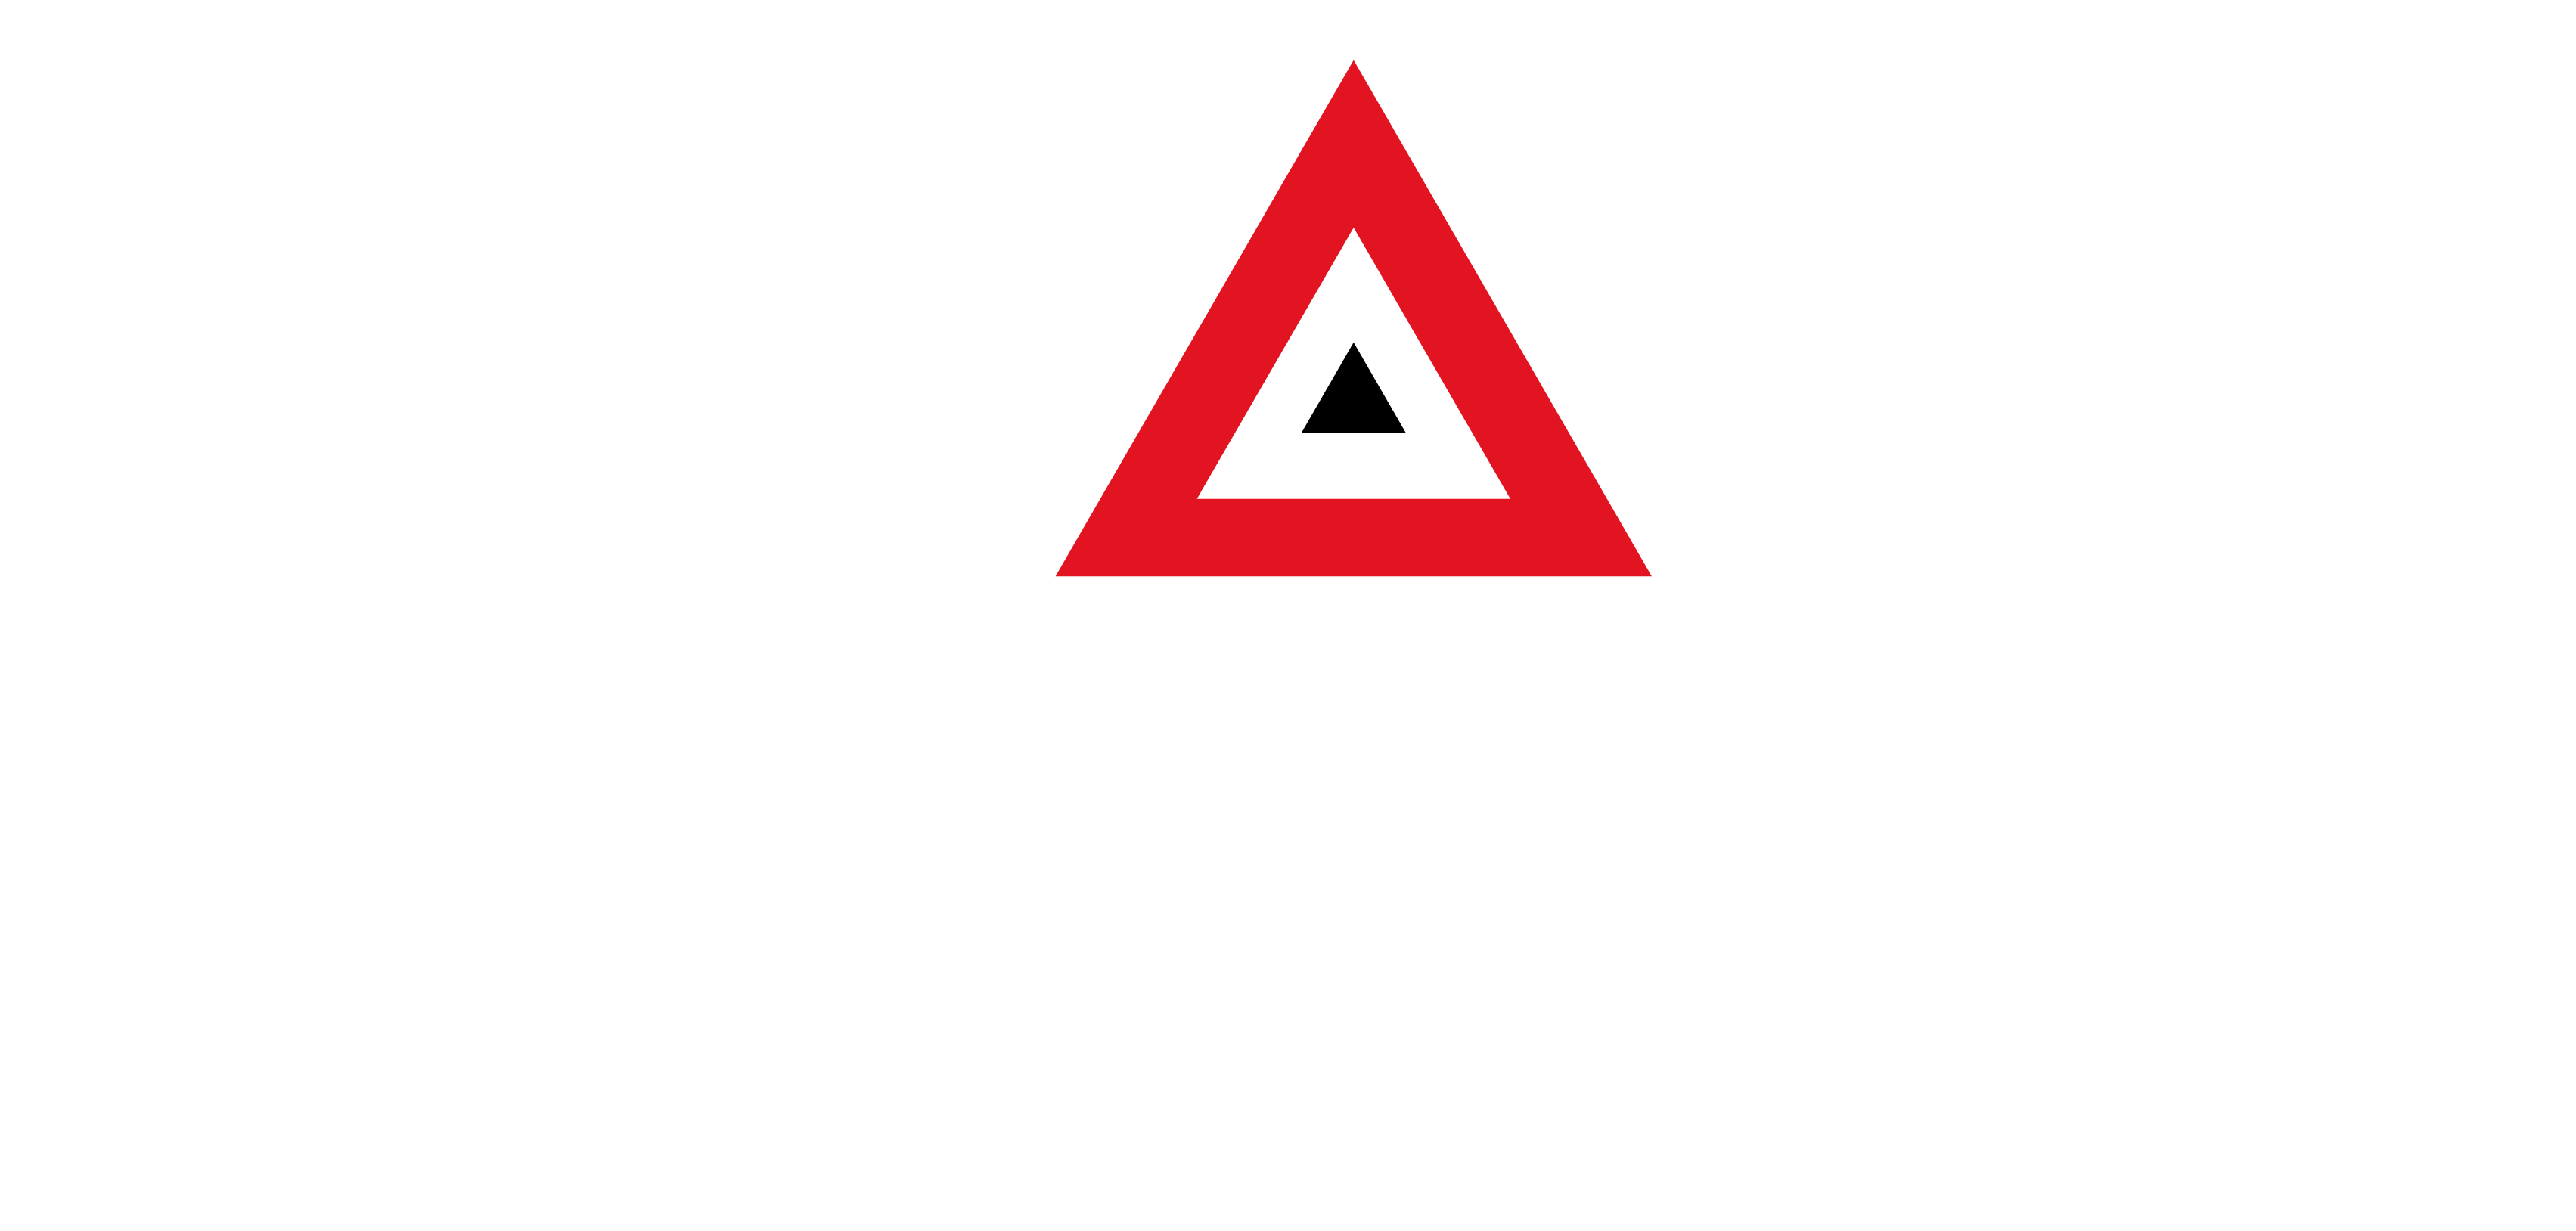 Defork